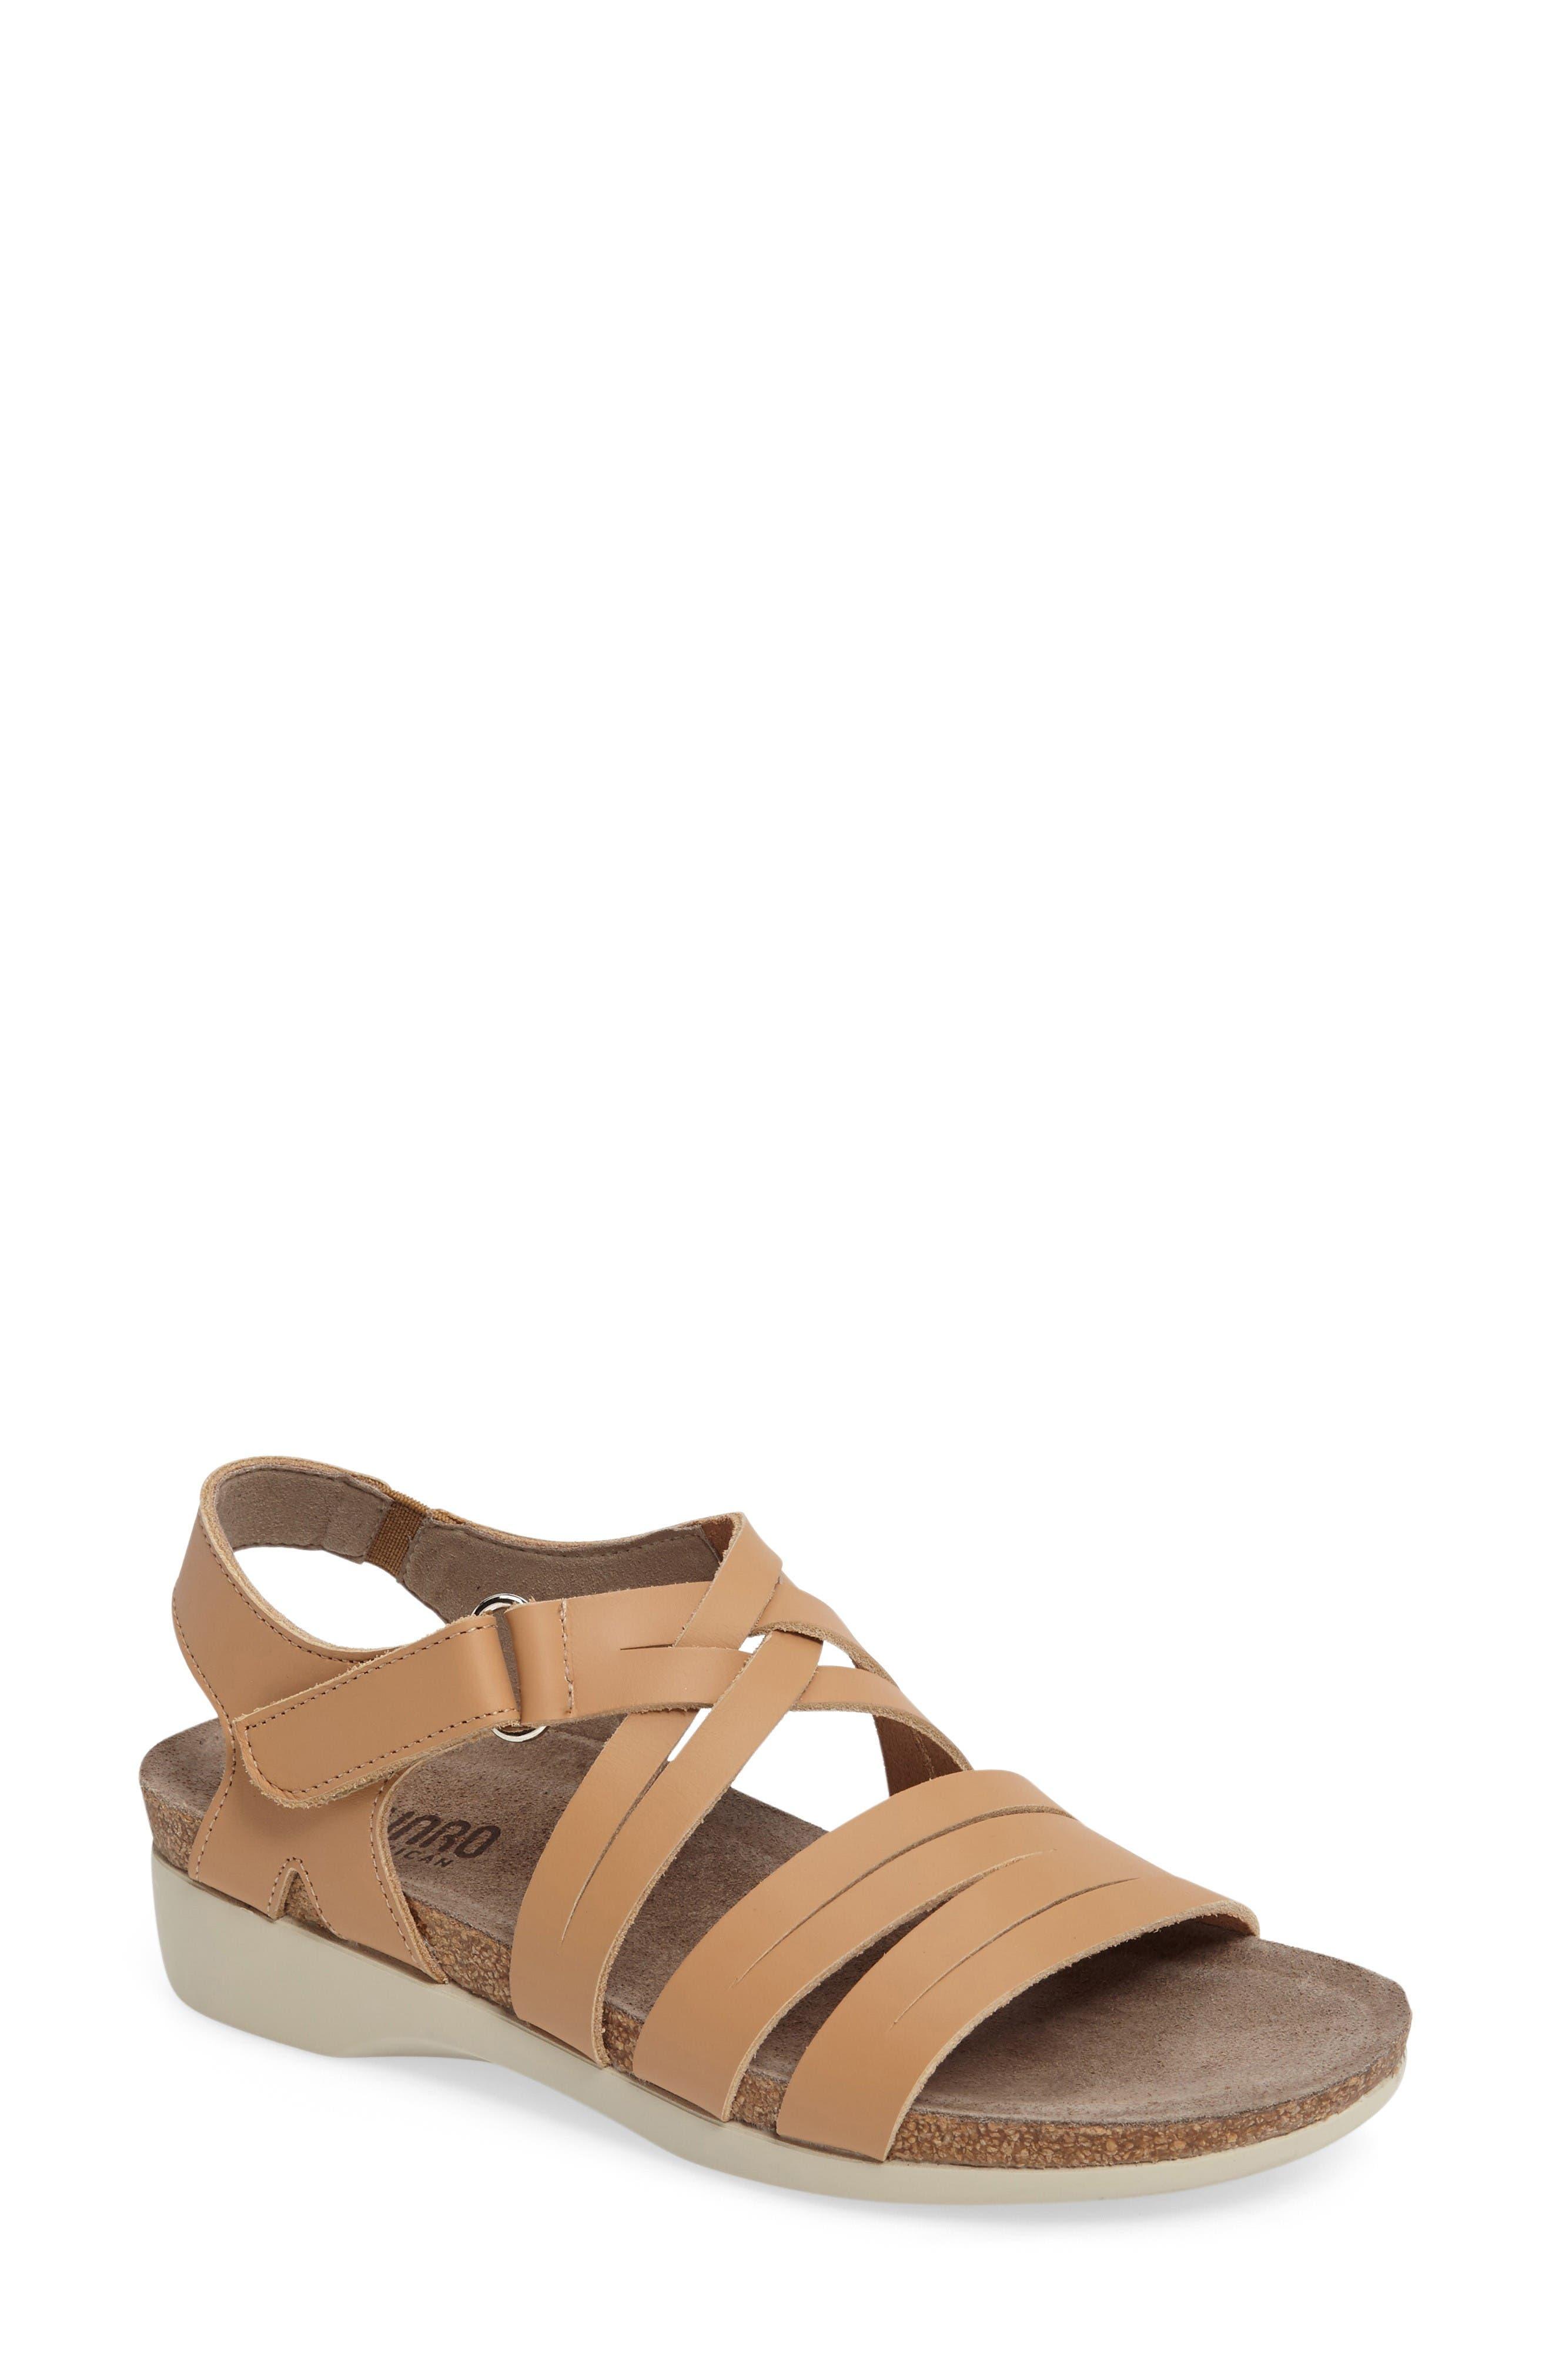 MUNRO Kaya Strappy Sandal